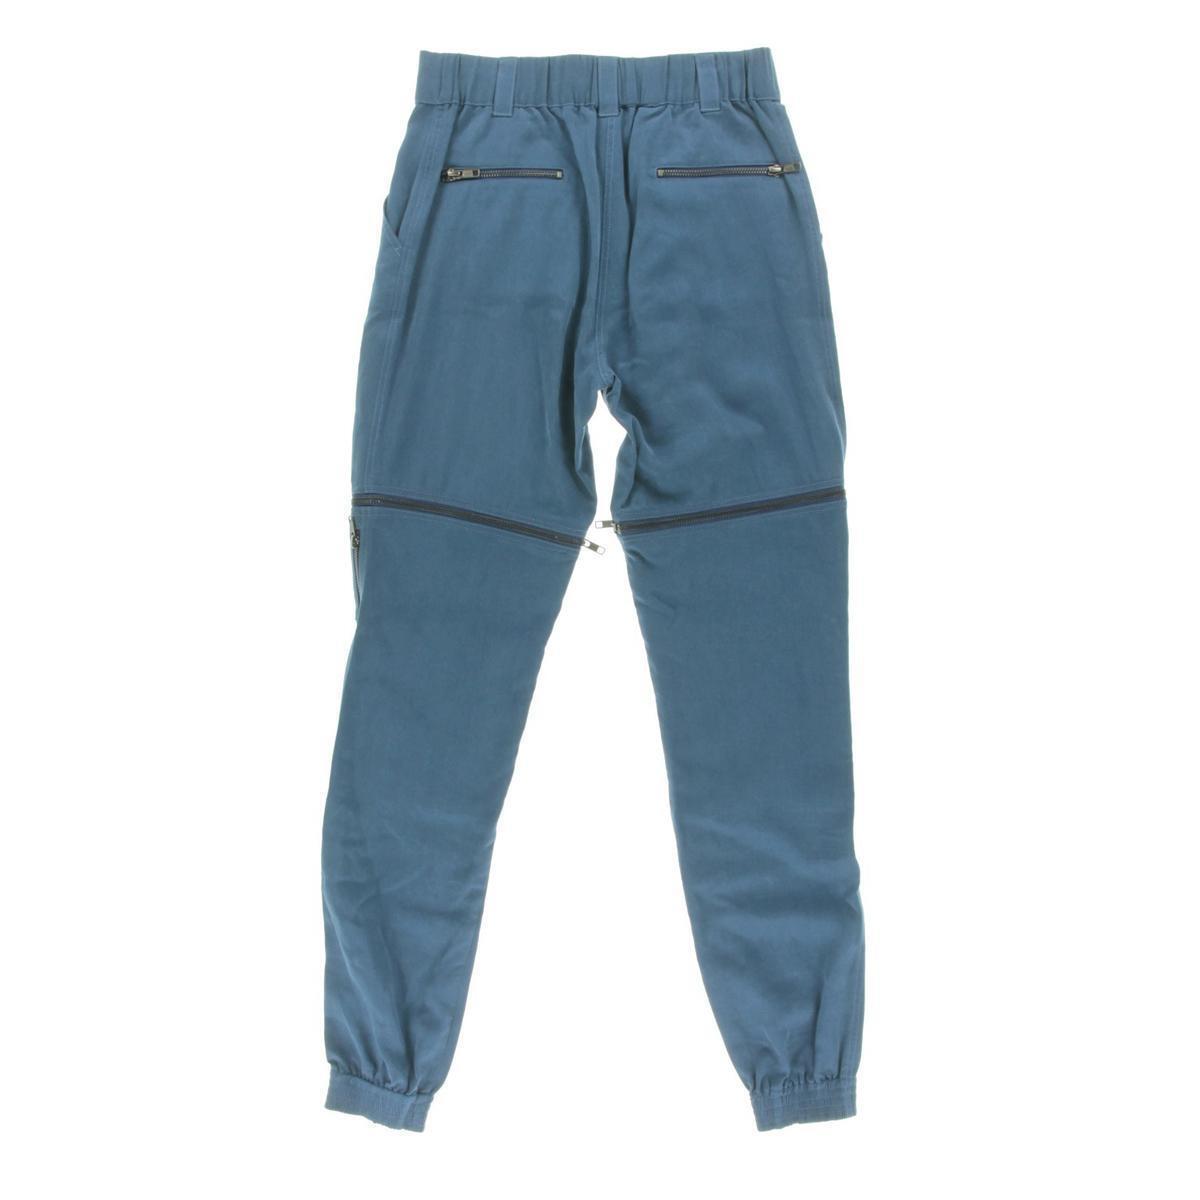 ac1974e4ed ... Catherine Malandrino 4531 Womens Womens Womens bluee Twill 2-In-1  Casual Pants 4